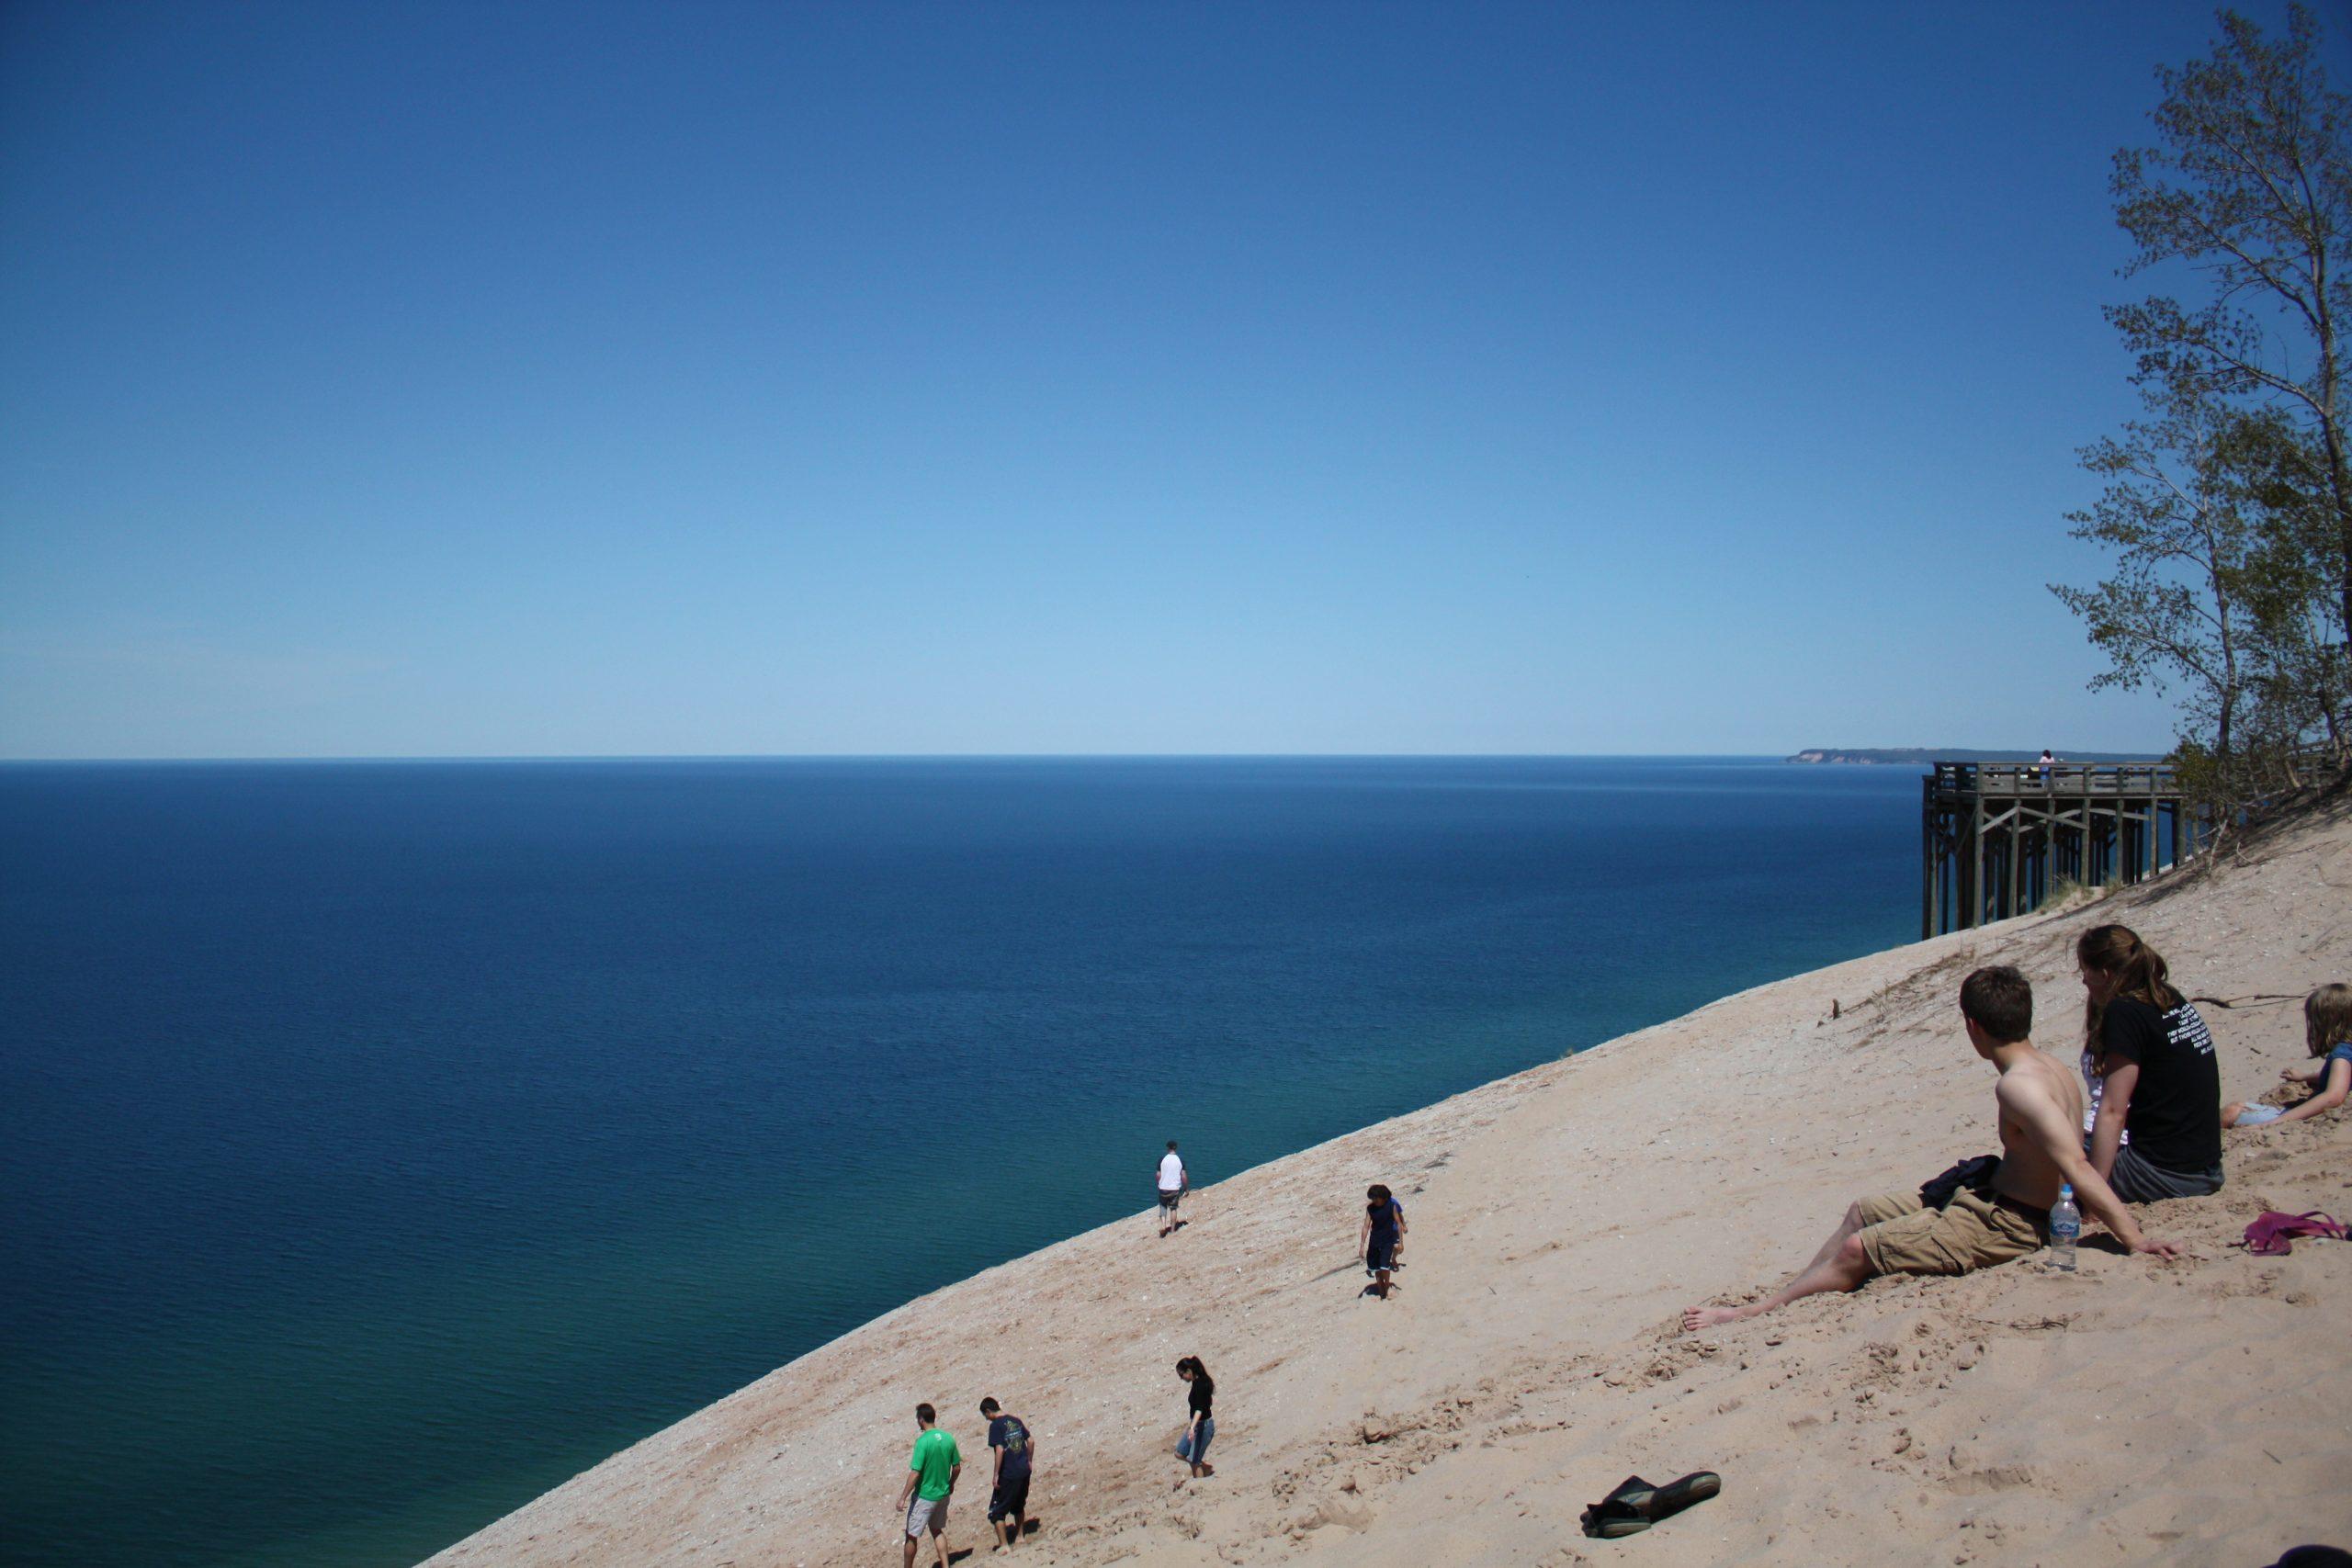 Amazing Sight-Seeing Destinations in Michigan-Sleeping Bear Dunes National Lakeshore and Lake Michigan